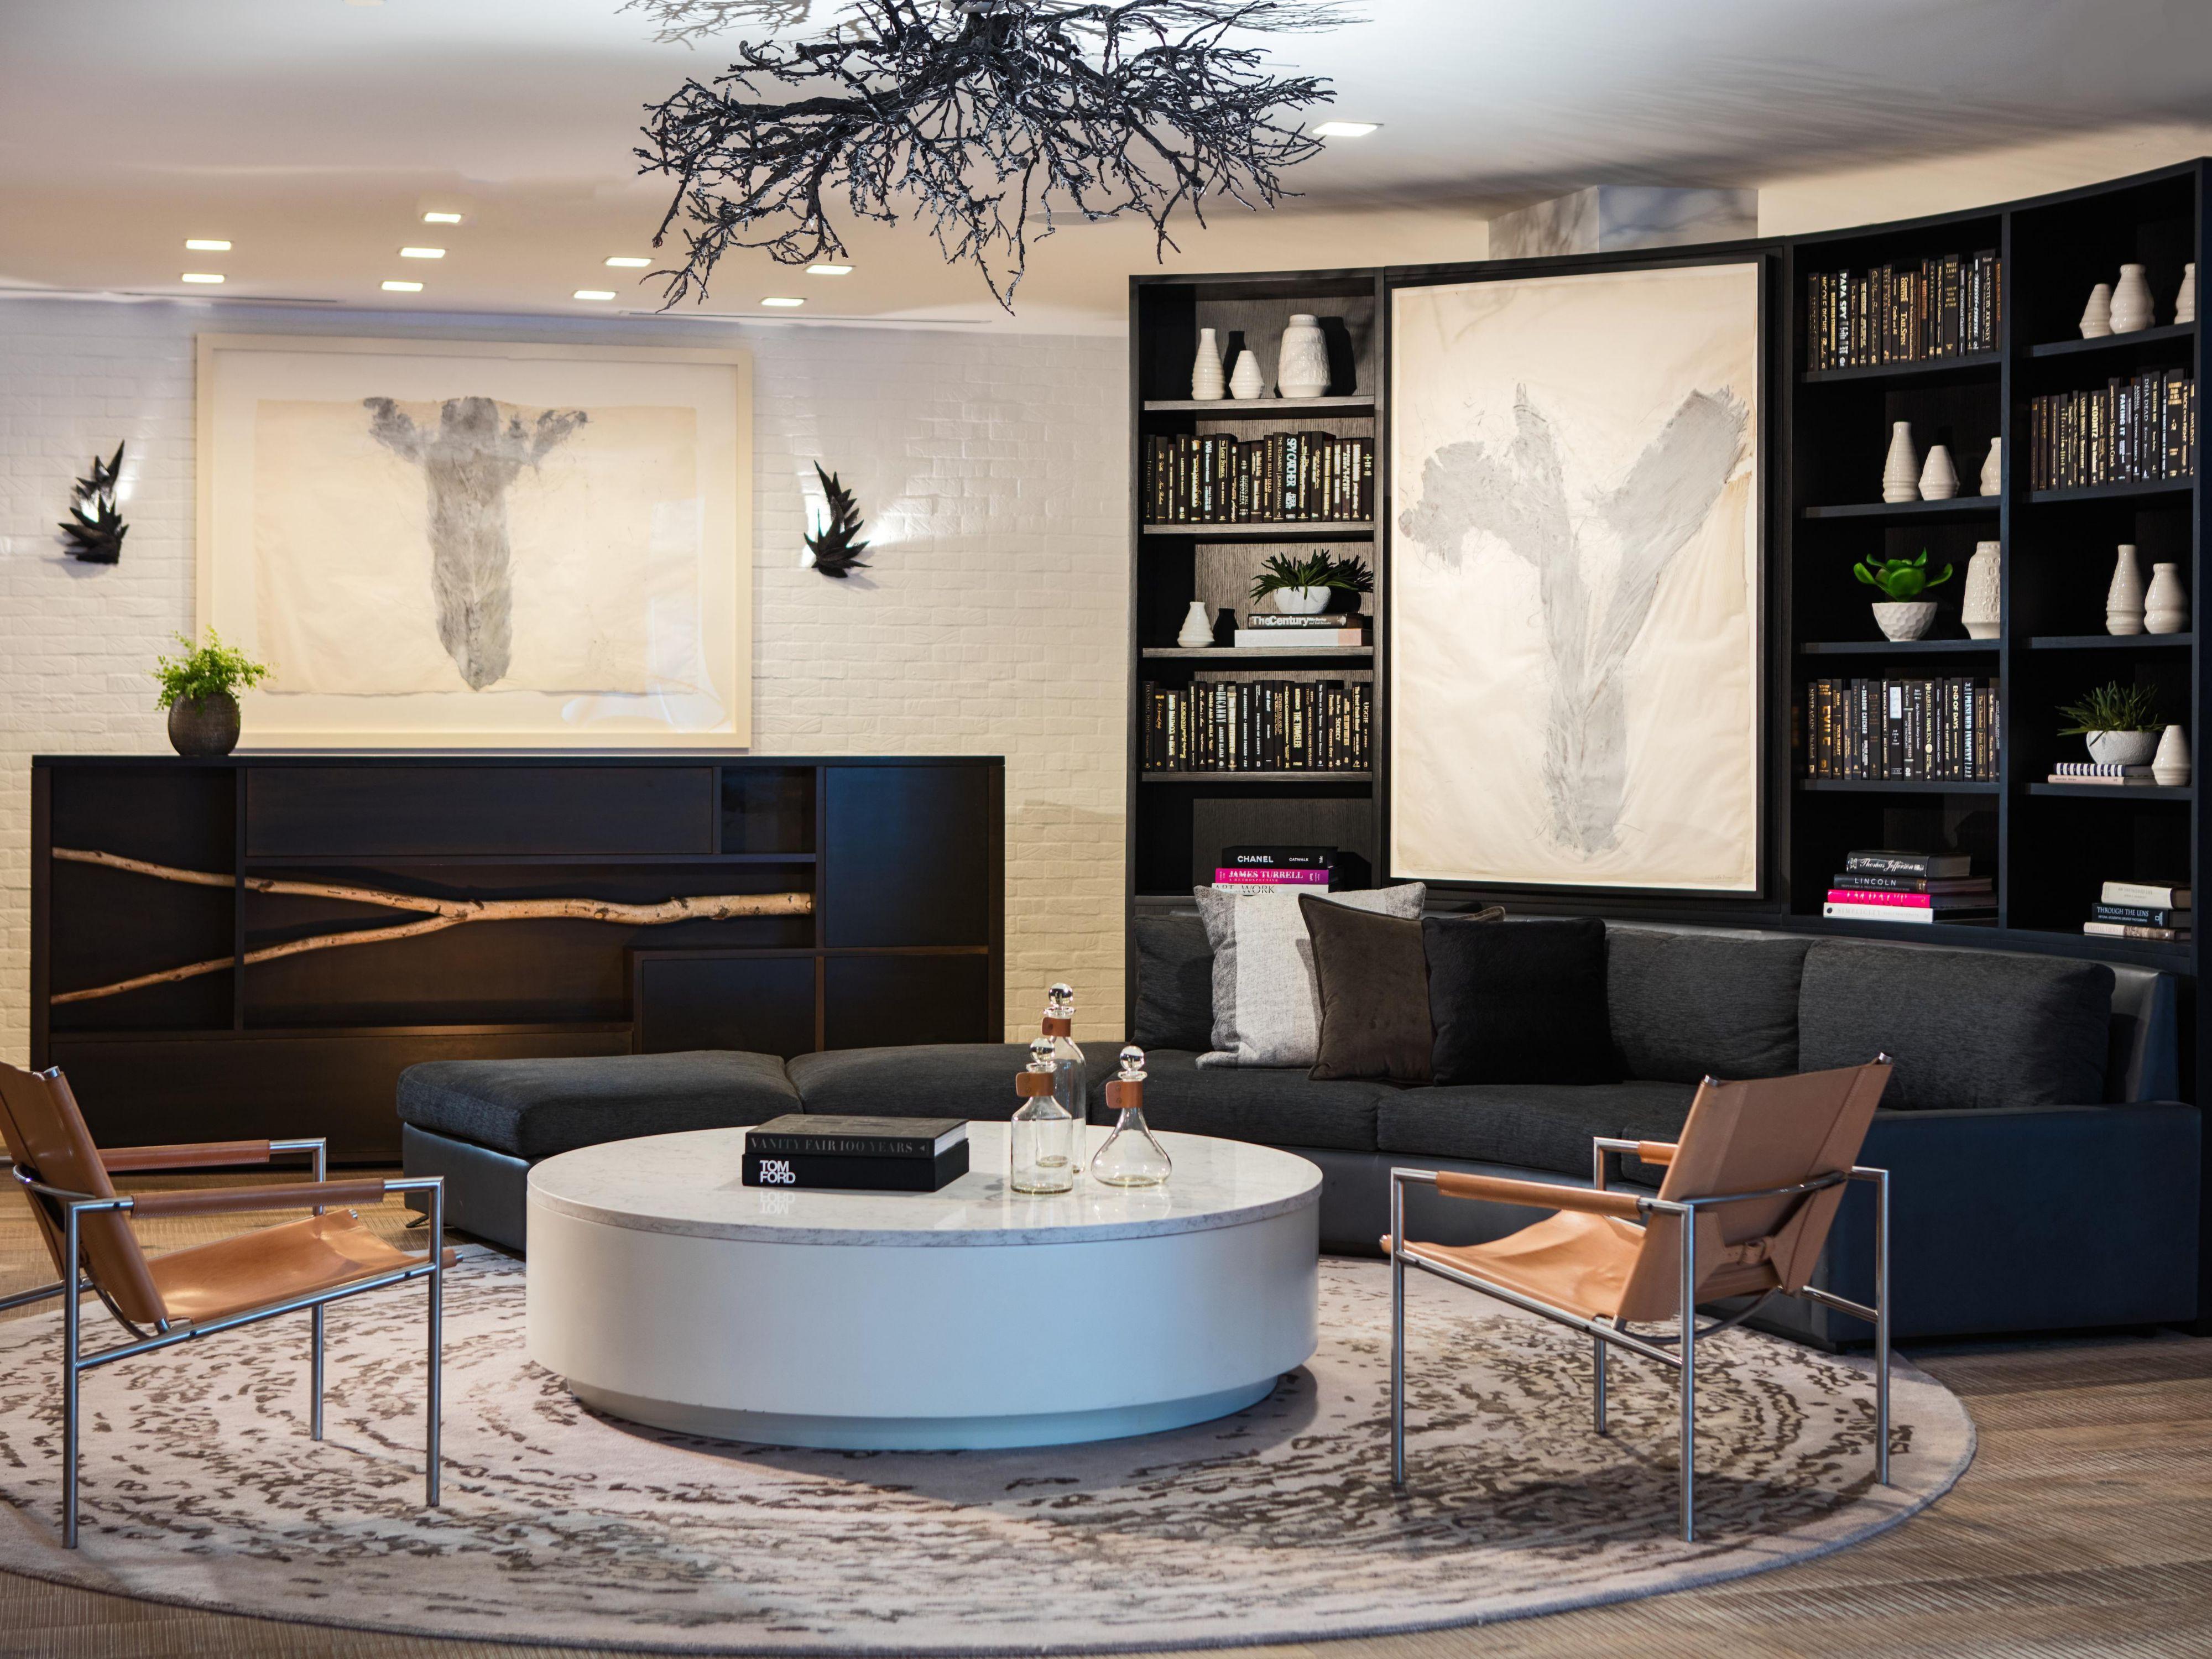 Kimpton Glover Park Hotel in Washington DC | Kimpton Hotels